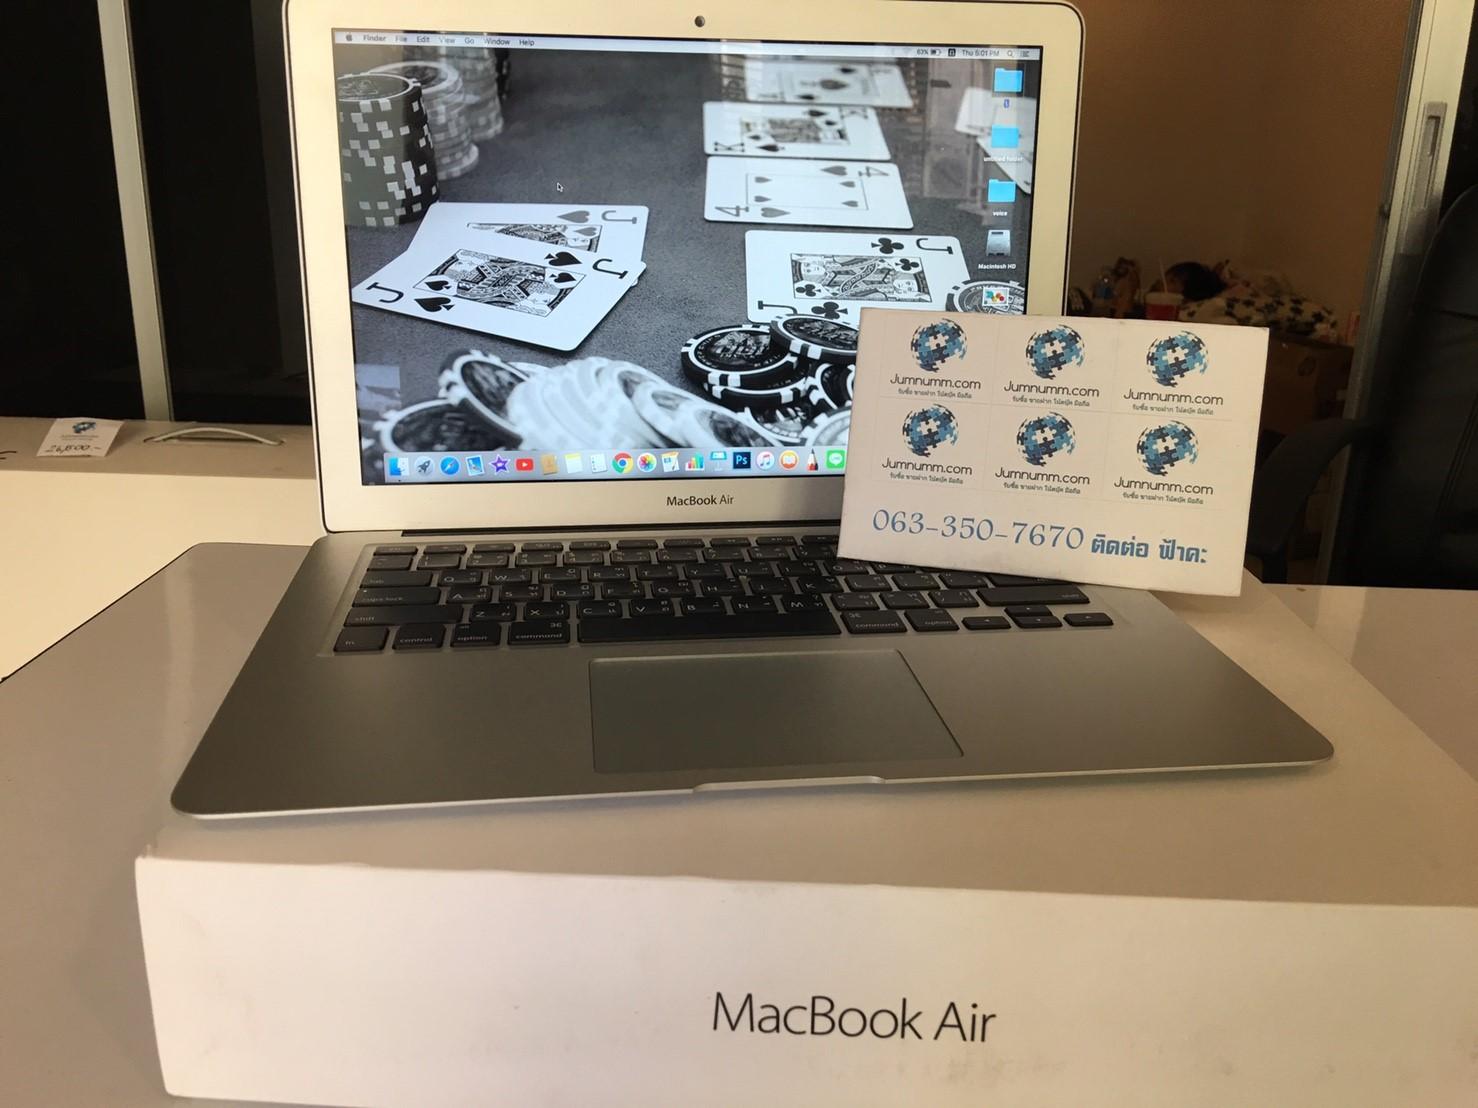 MacBook Air 13 inch Early 2015 ตัวเครื่องสภาพ 90% ไม่มีรอยตกรอยบุบ กล่องอุปกรณ์ครบ รับประกัน 1 เดือน